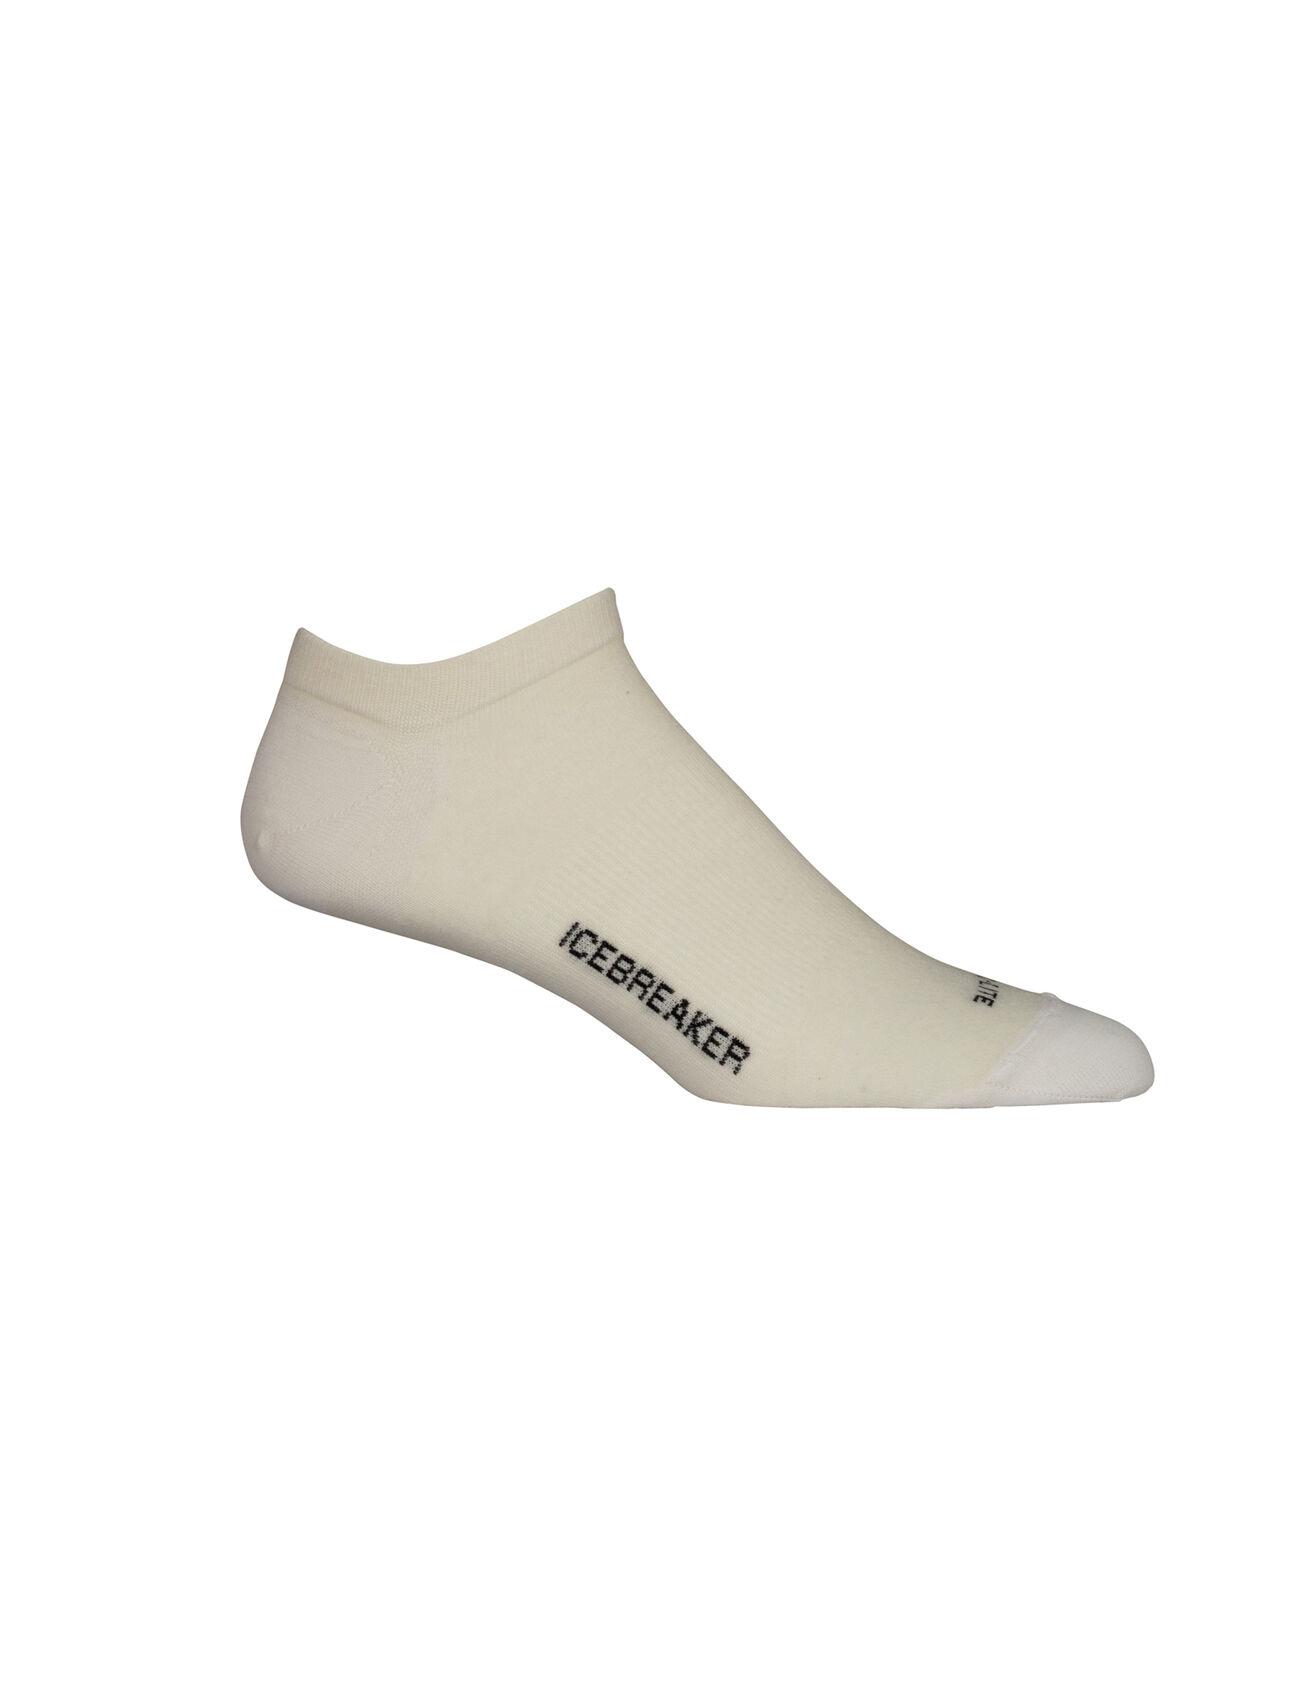 Cool-Lite™ Merino Lifestyle No Show Socks